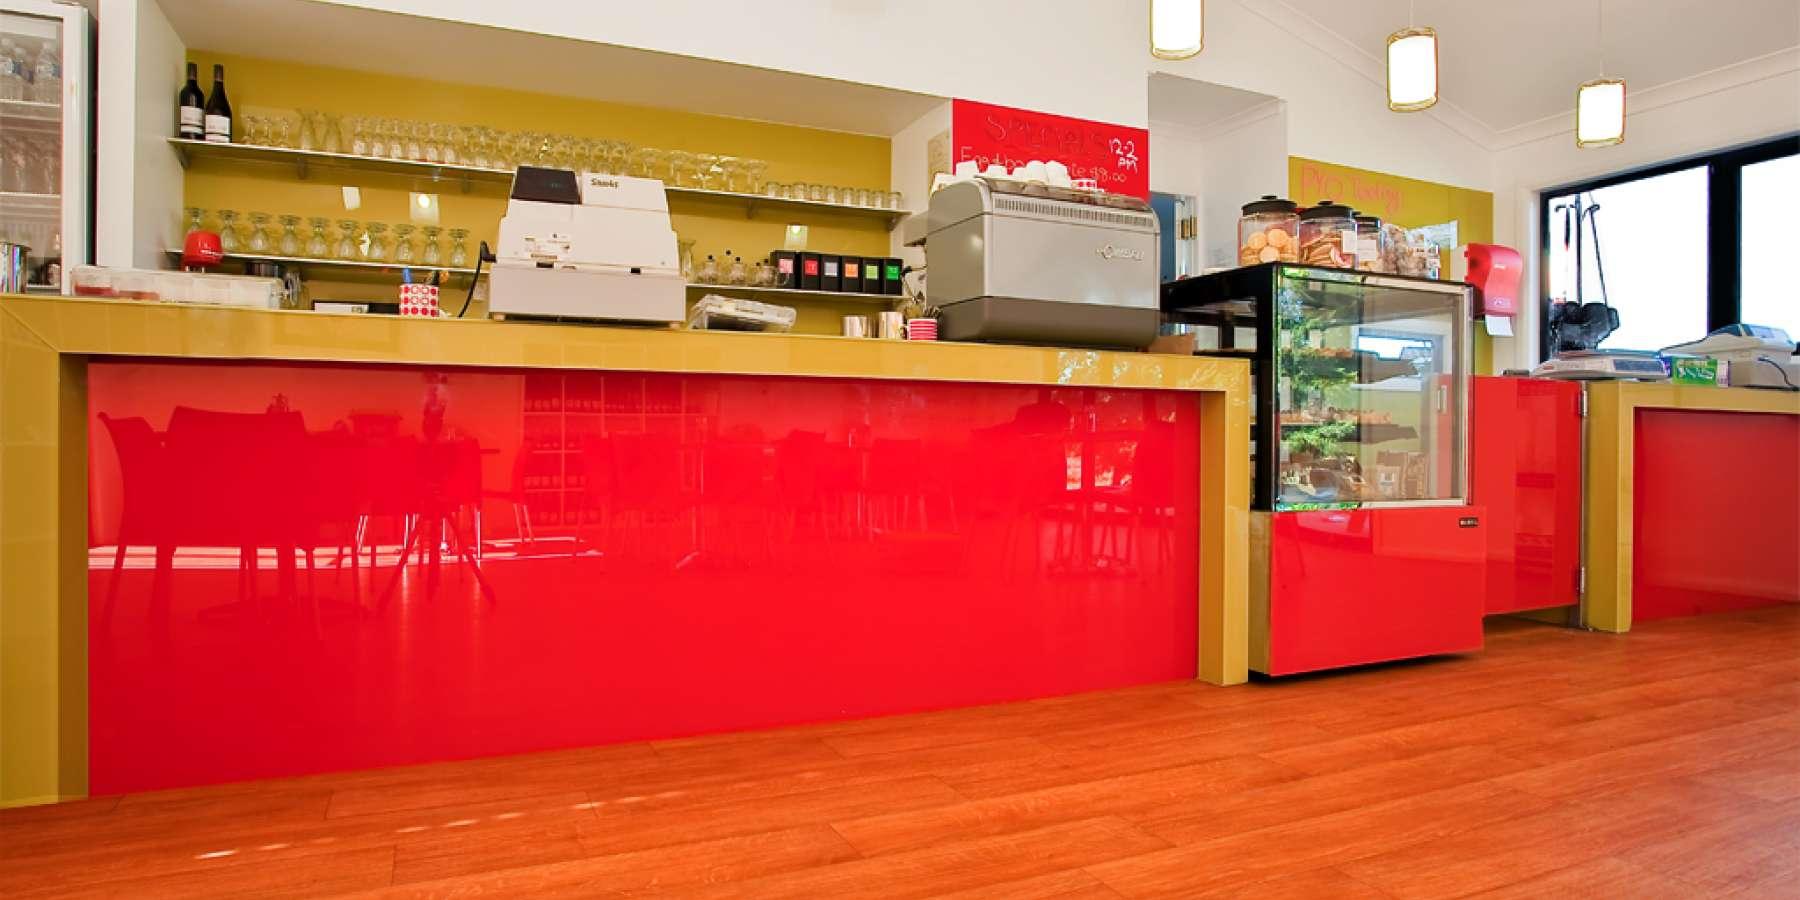 Strawberry farm cafe modular building